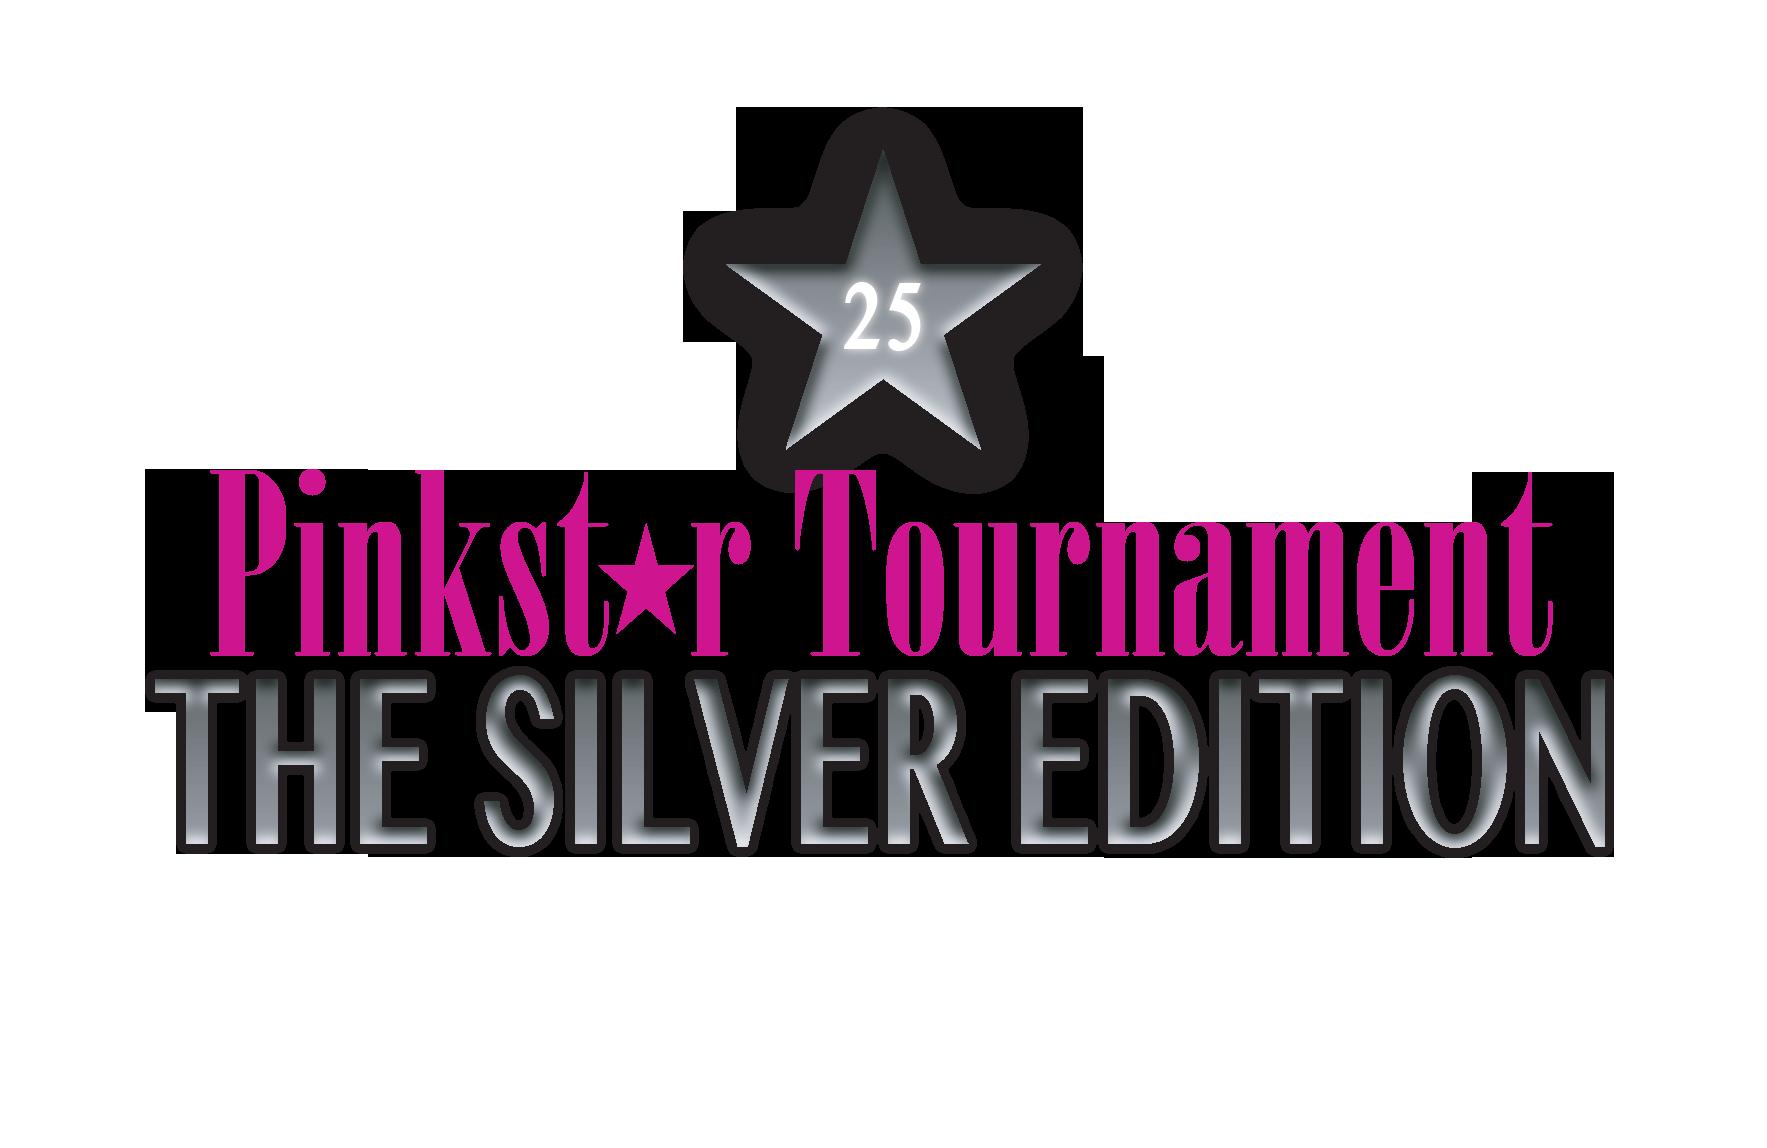 Pinkster Tennis Tournament @ Amsterdam | North Holland | Netherlands